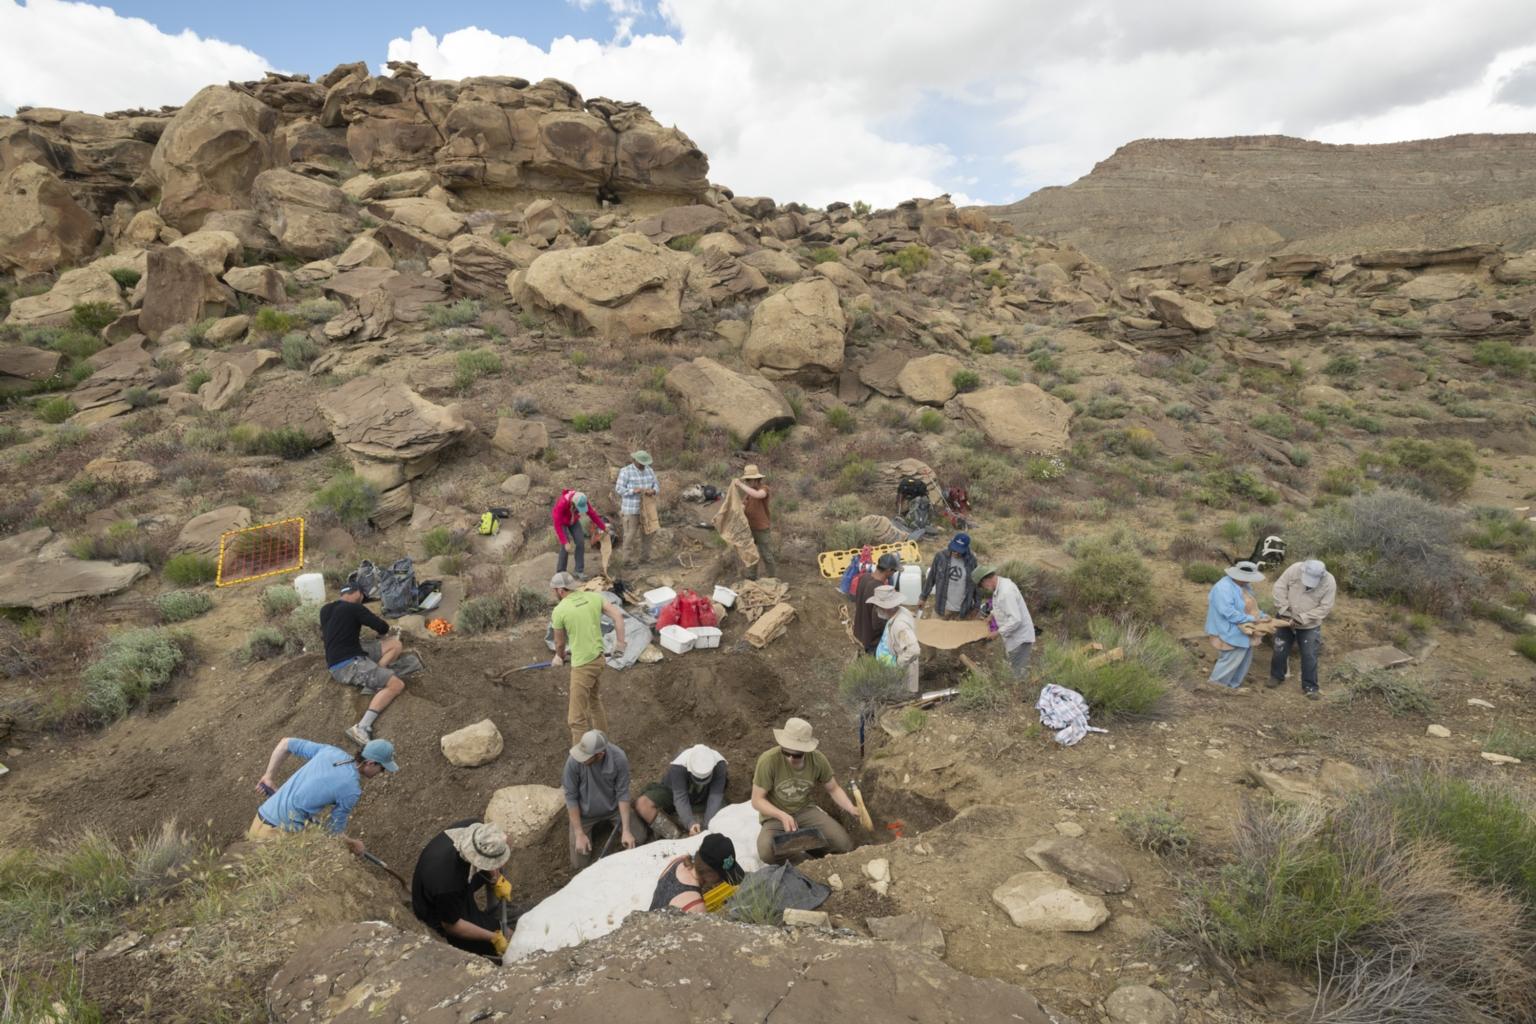 Excavating Hadrosaurus with Dr. Joe Sertich in Grand Staircase Escalante, Utah